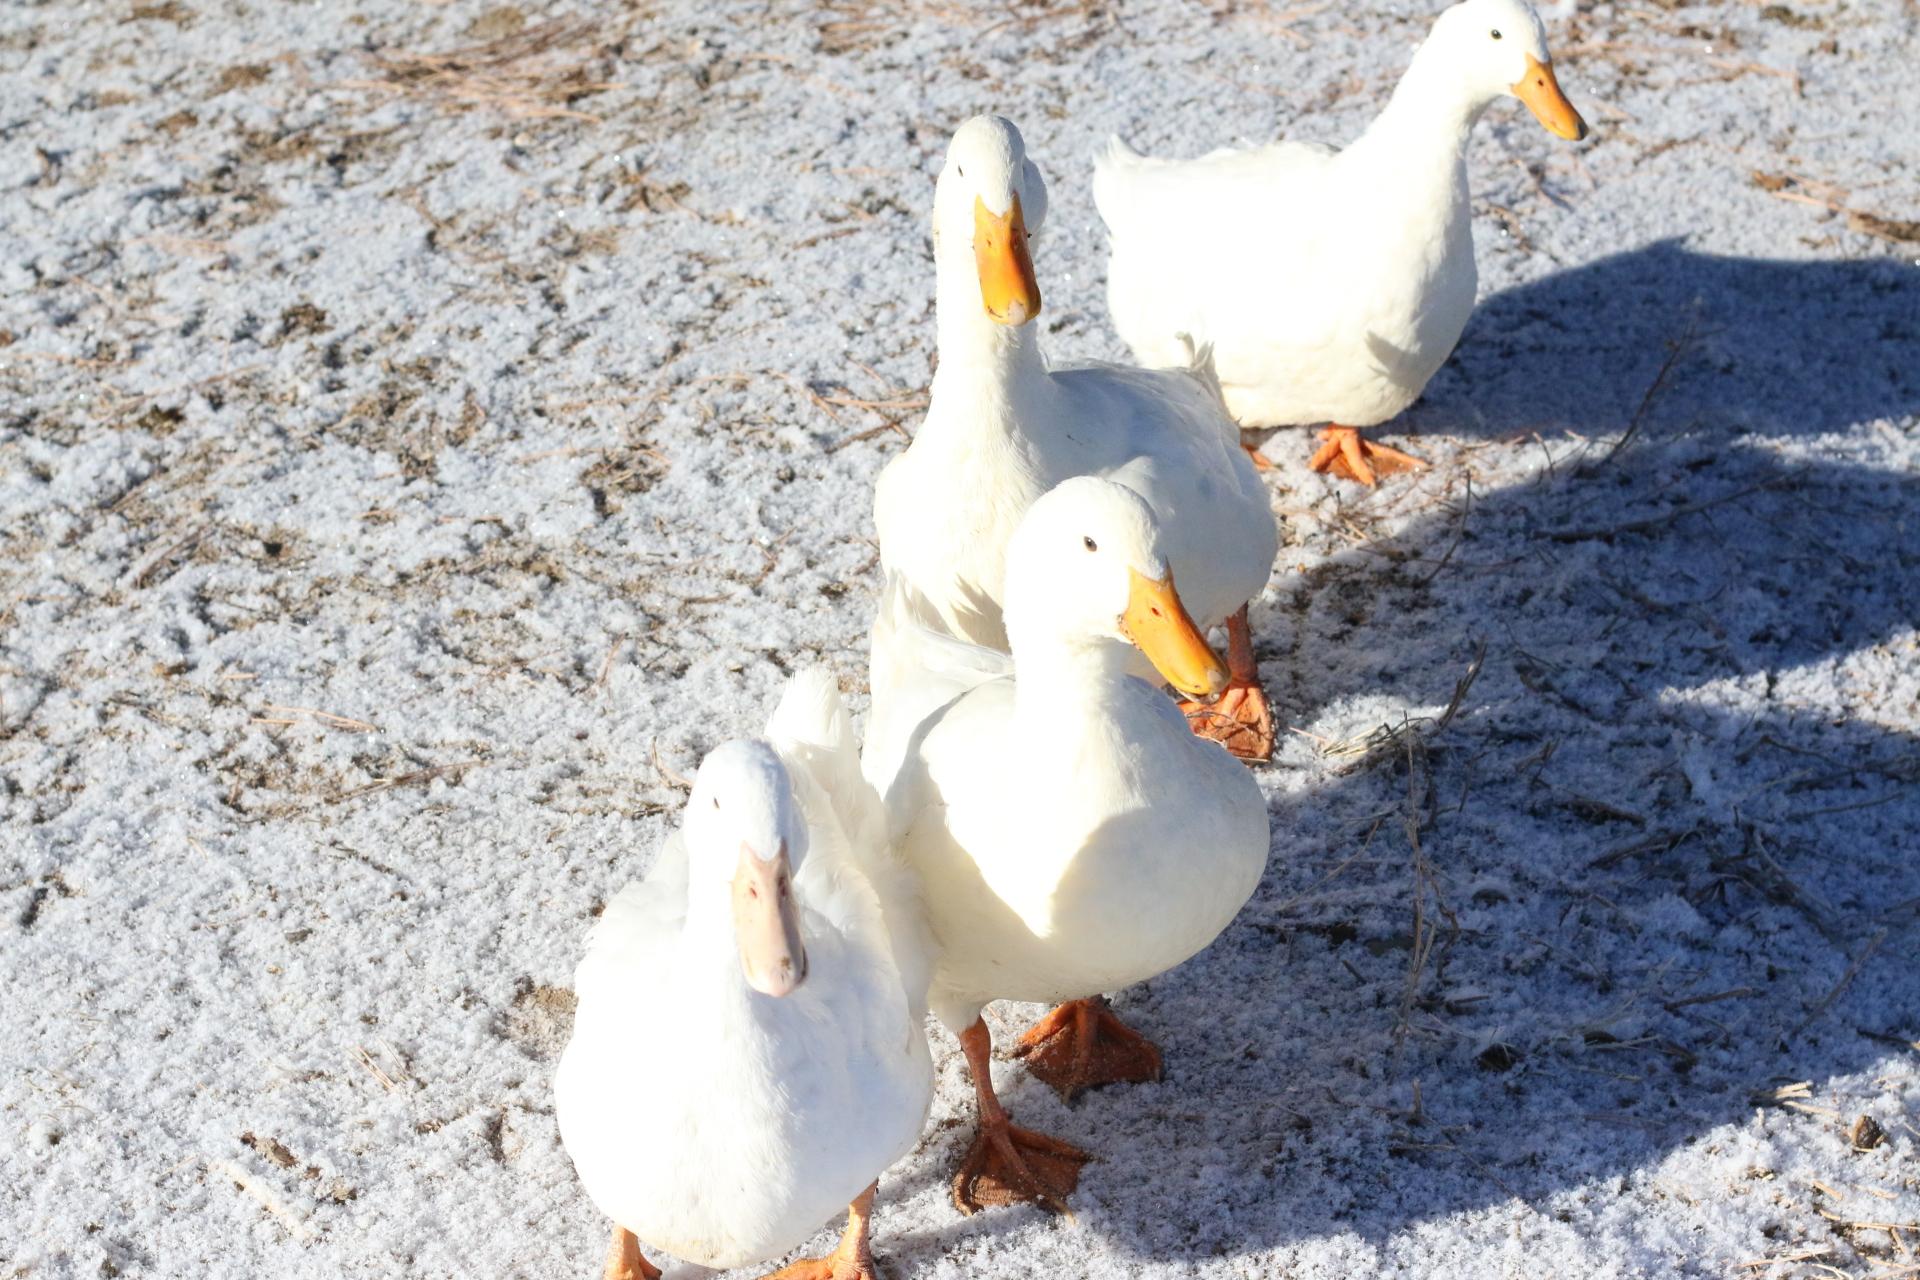 4 Farm Ducks--Pepper and Salt(Winter 2015) Huey and Duey(Spring 2015)